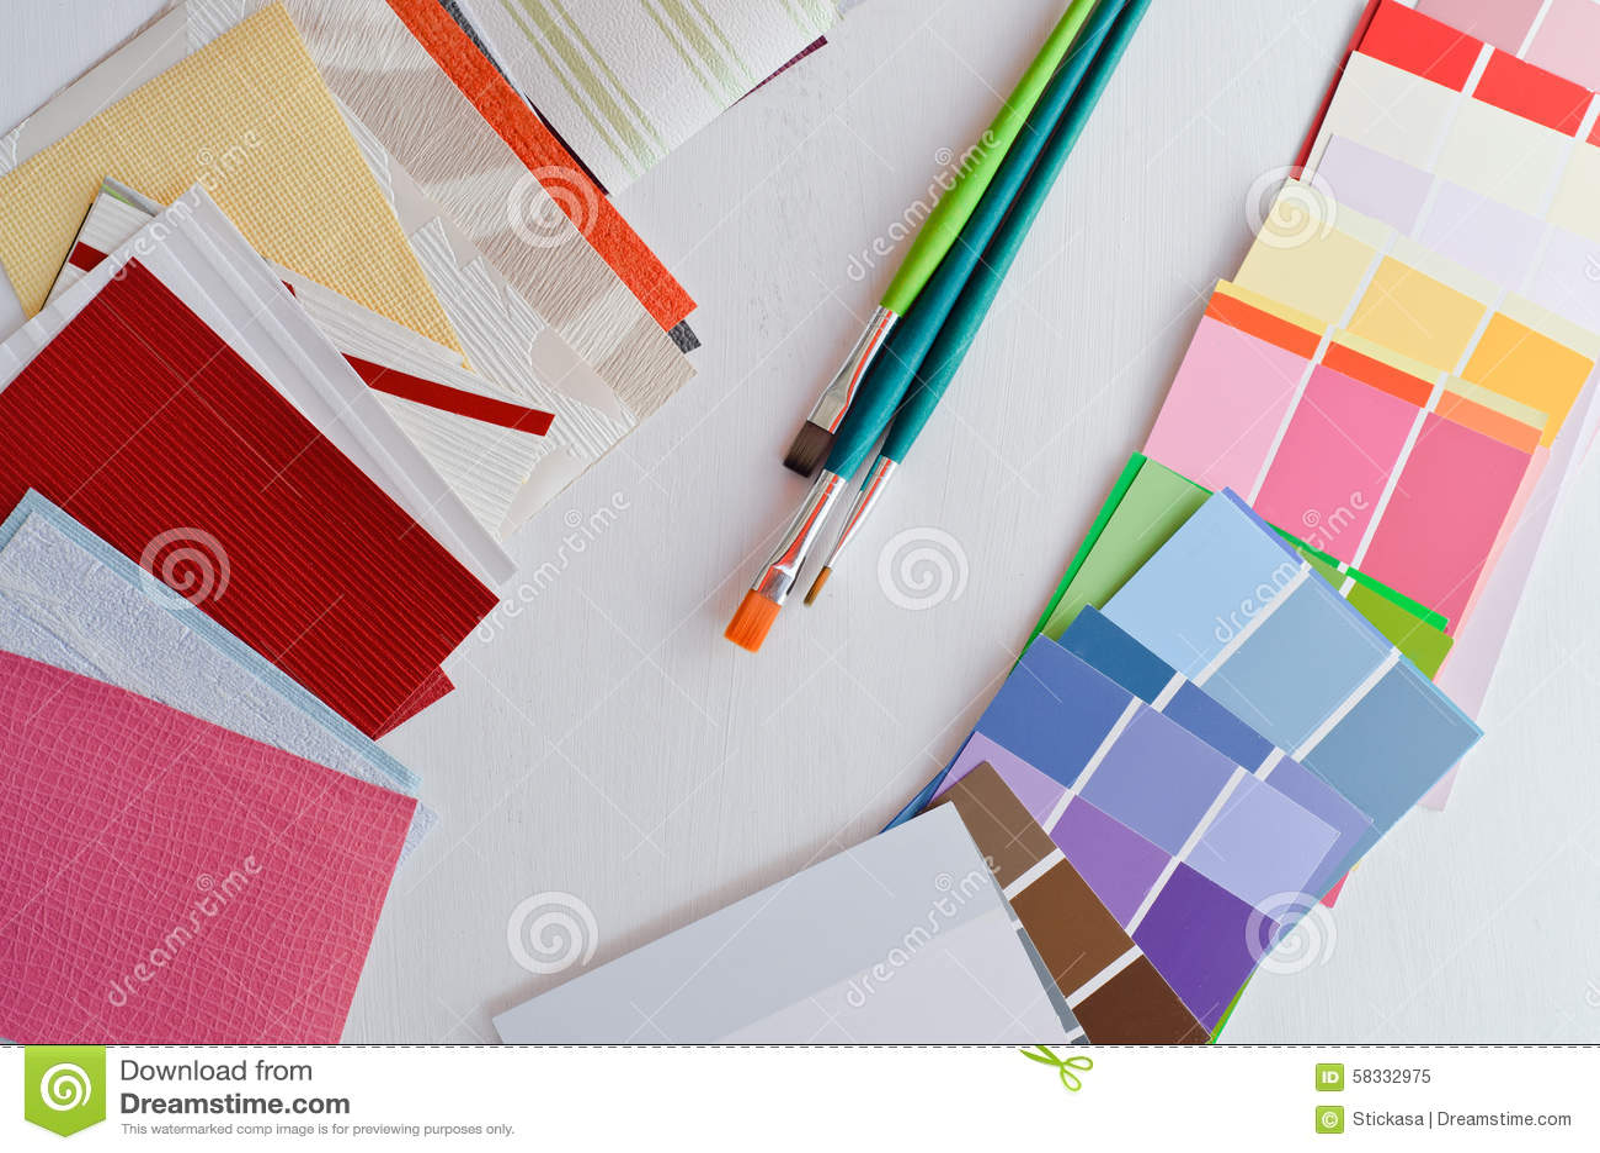 Renovation Sample Colors And Wallpaper